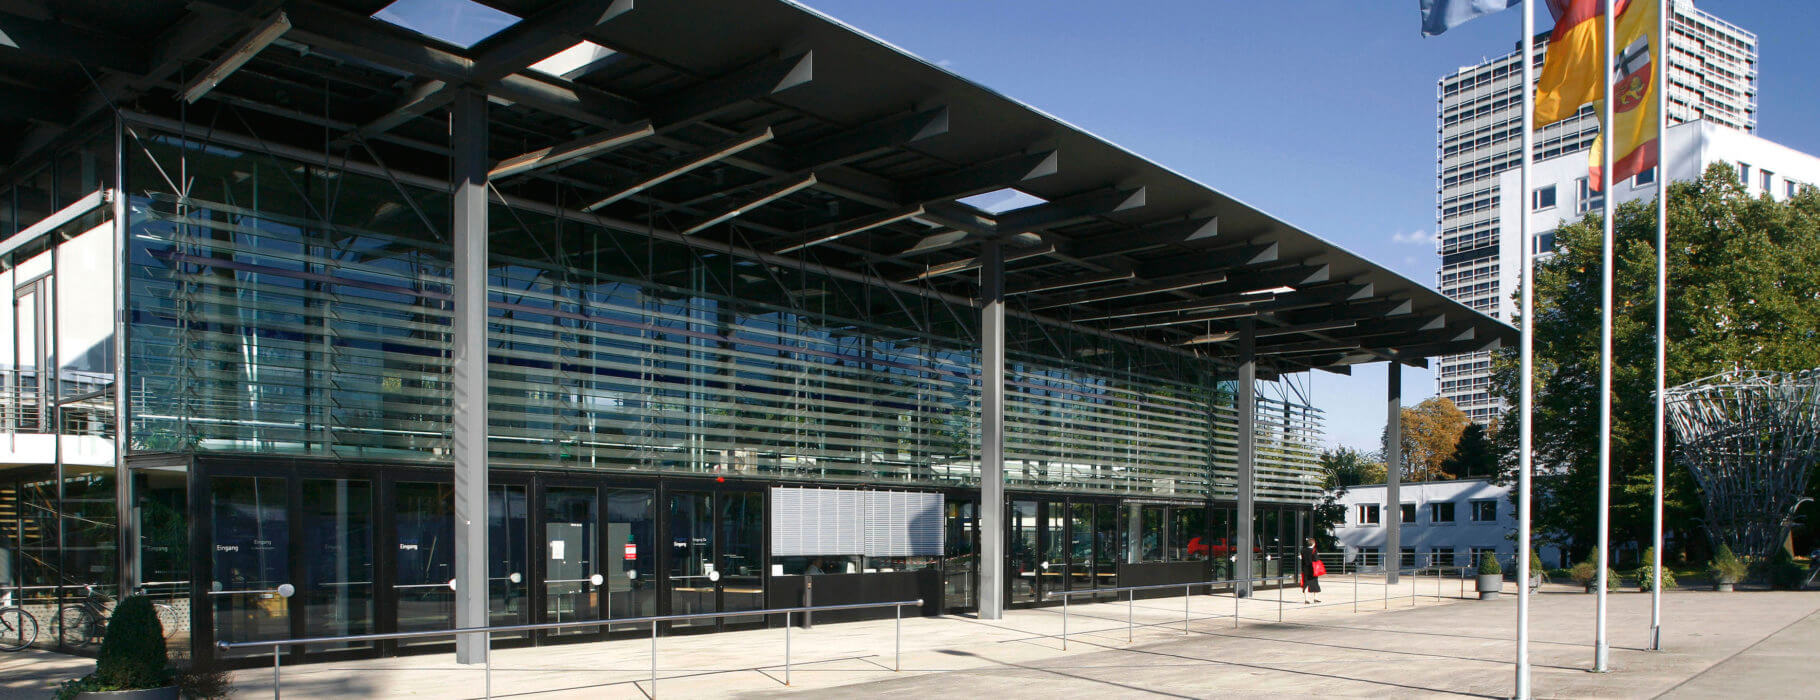 mplus-spotlight-world-conference-center-bonn-wccb-aussenansicht